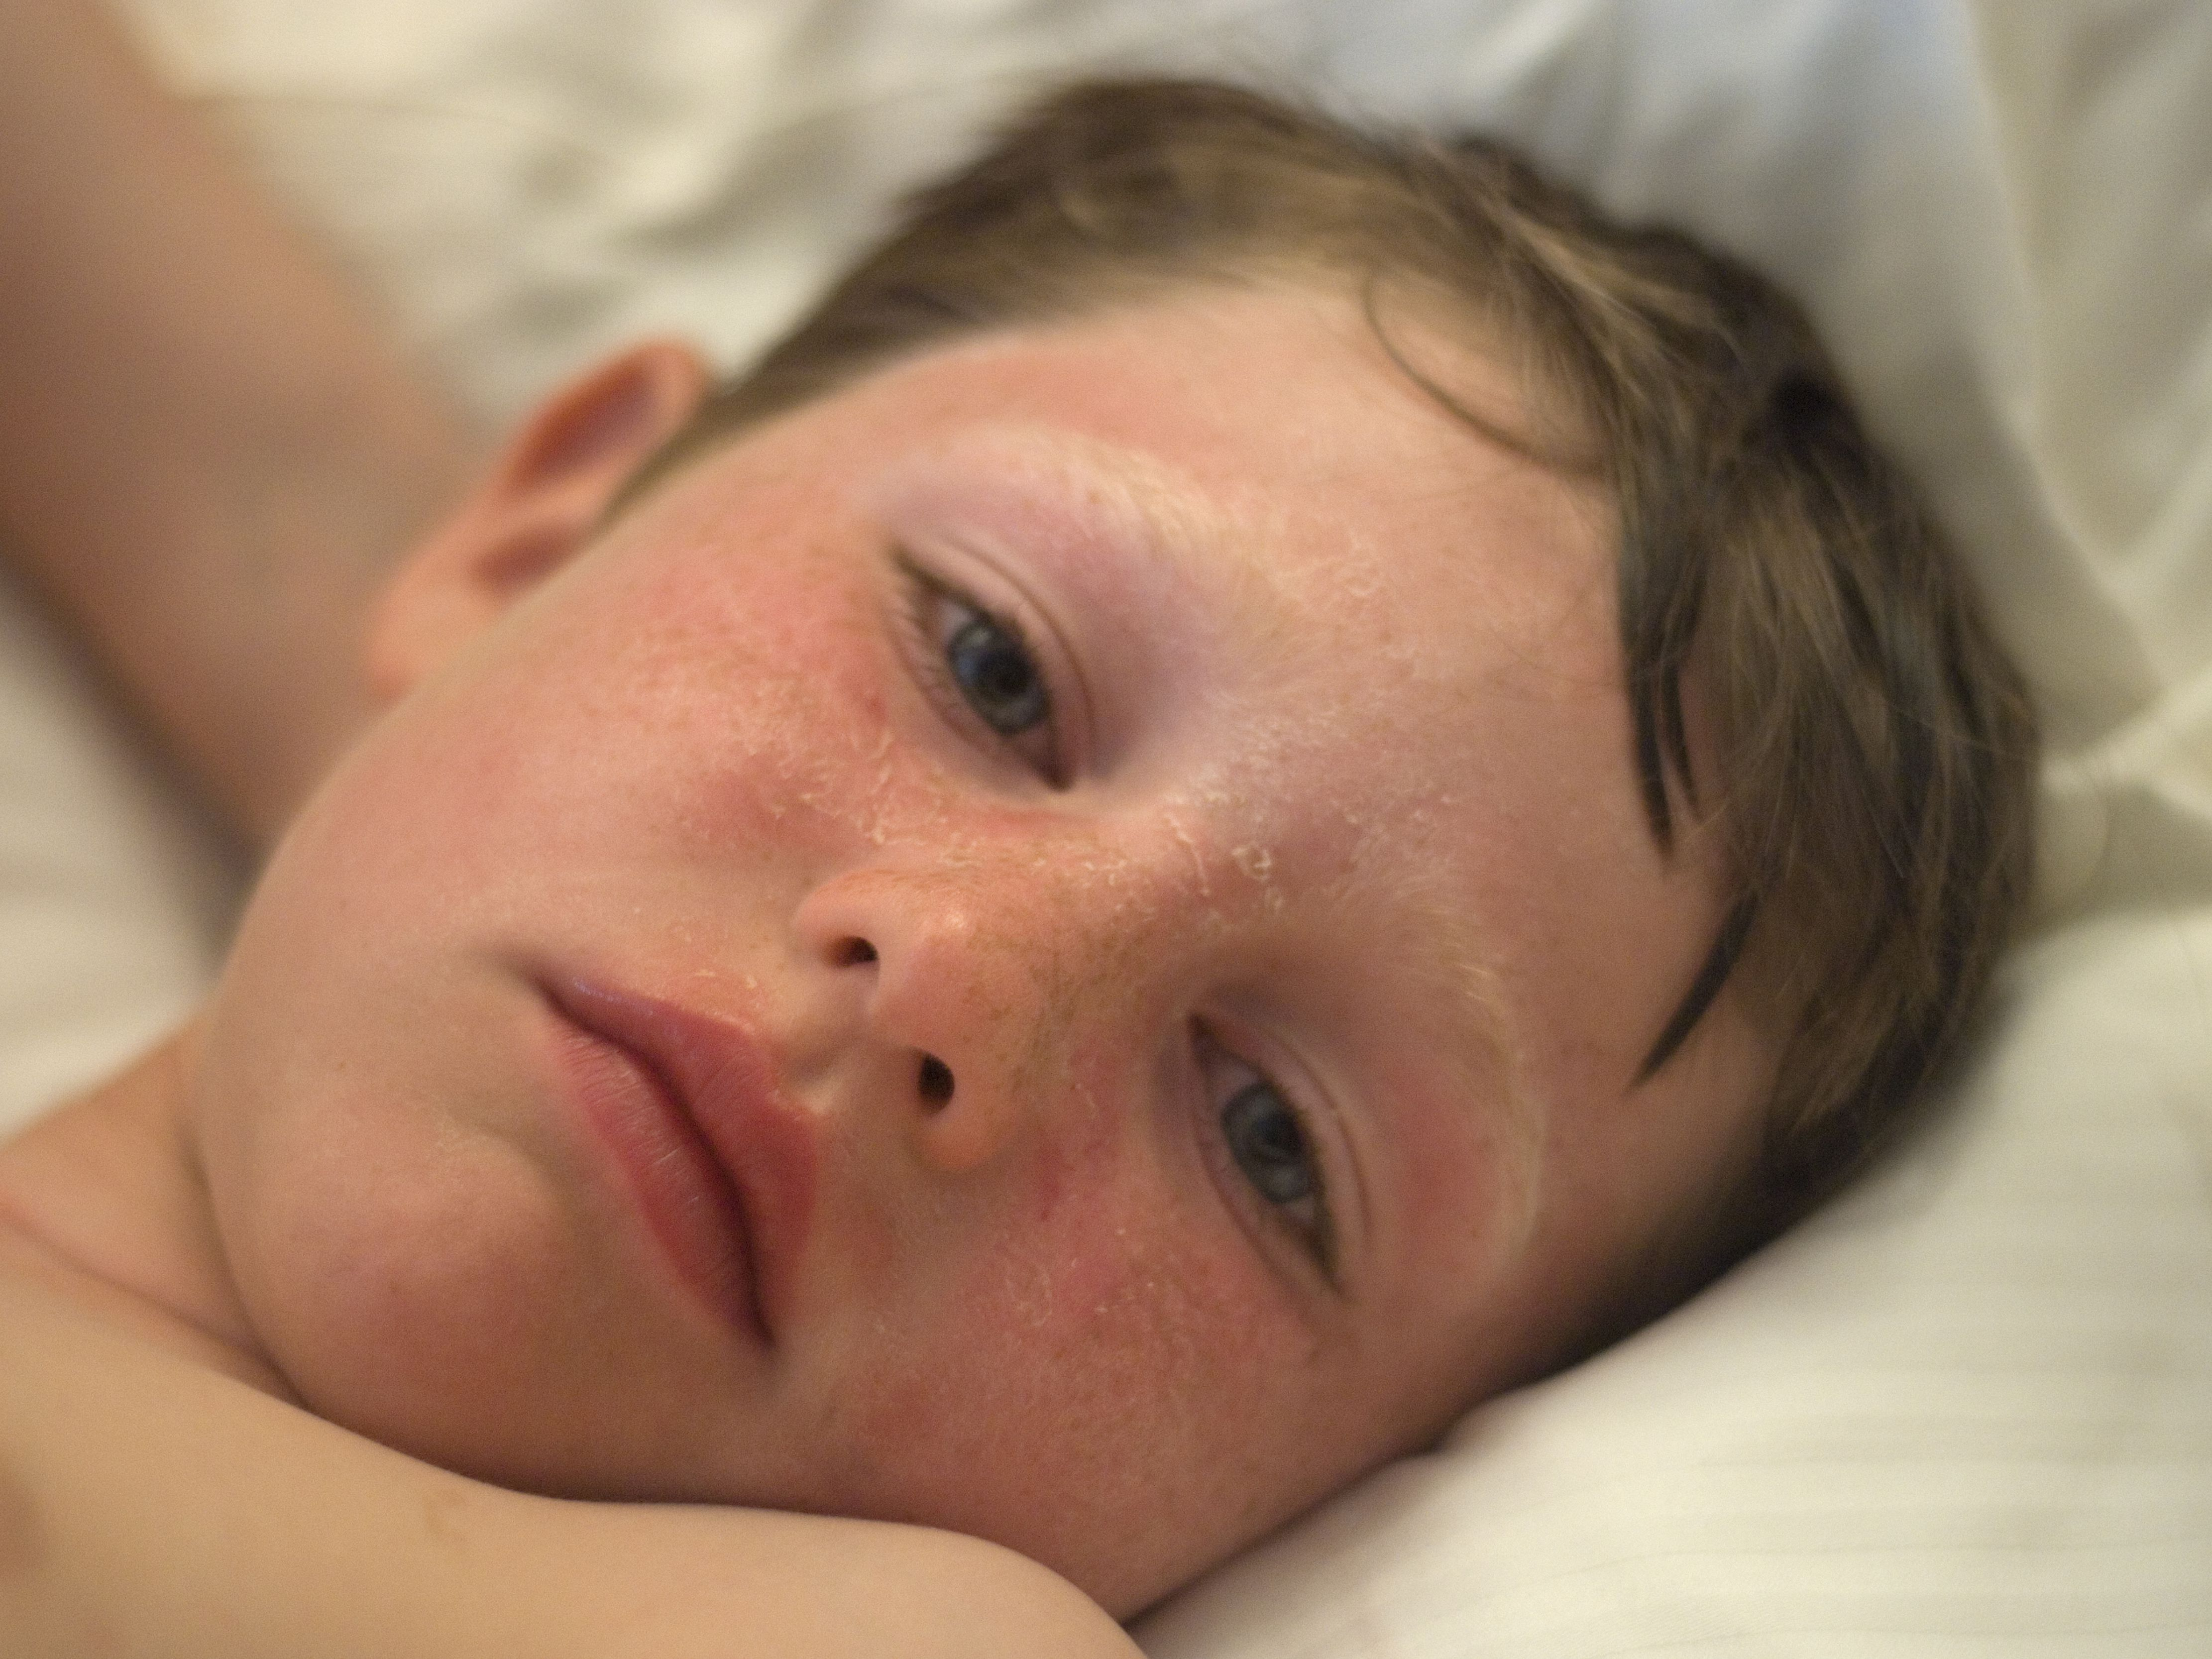 Treating Sunburns In Children